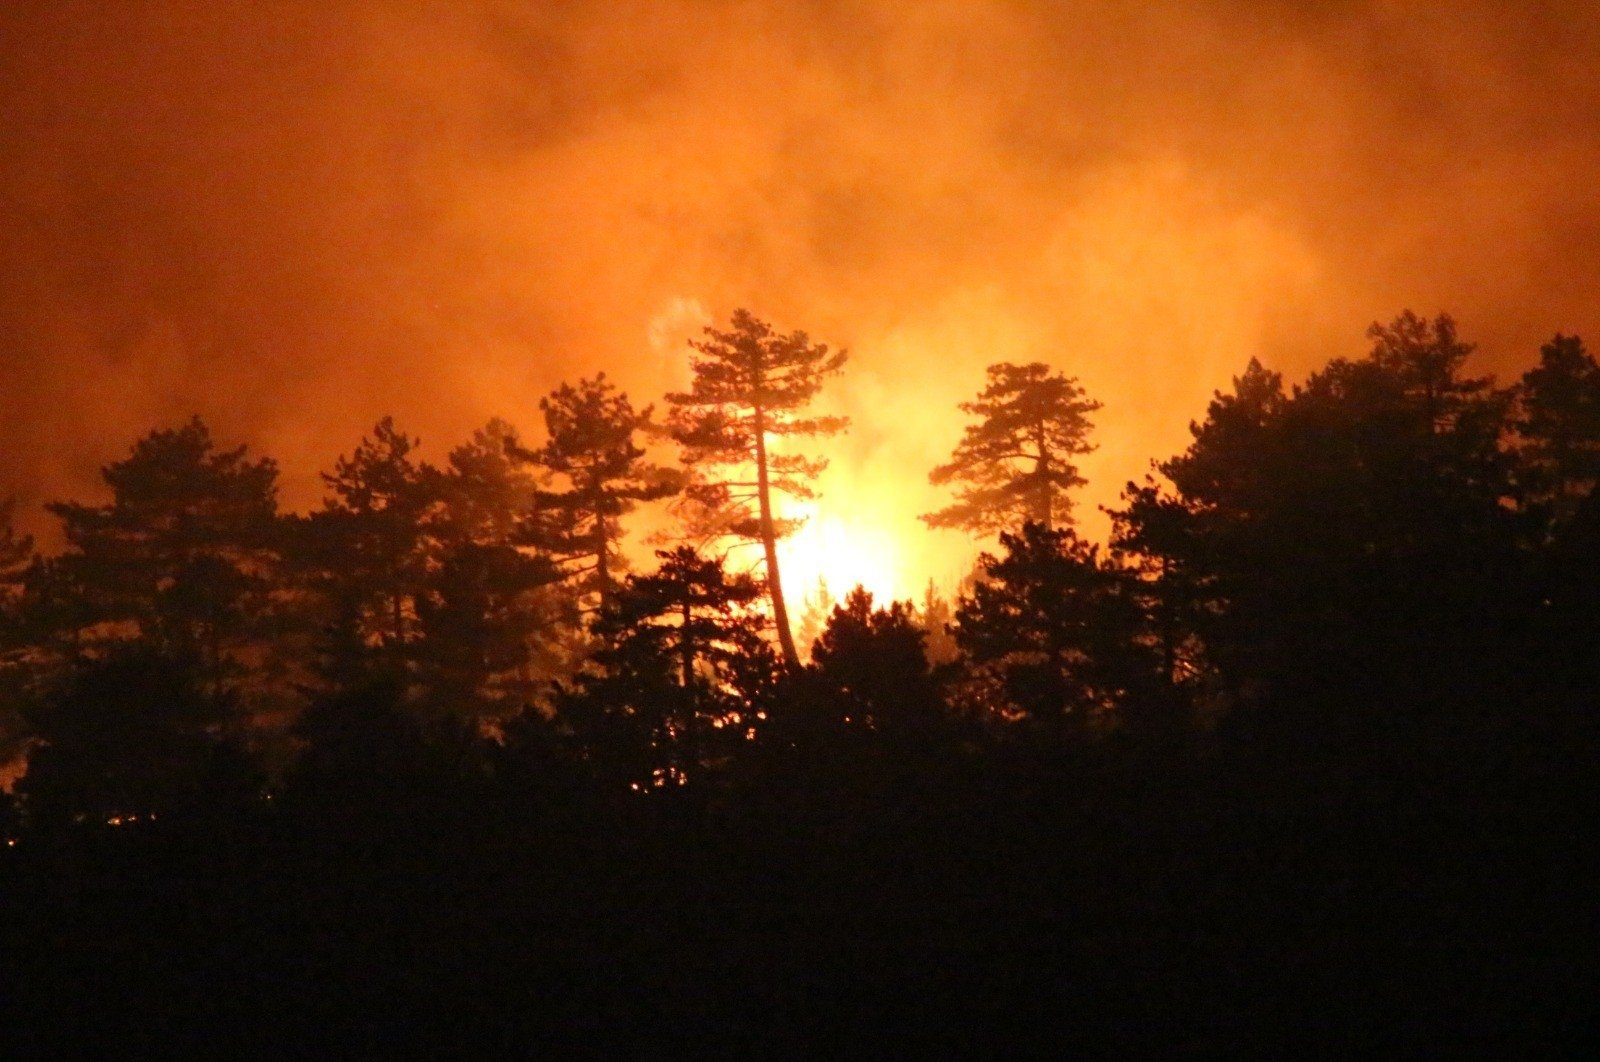 Flames engulf the forest in Denizli, western Turkey, Sept. 4, 2020. (İHA Photo)